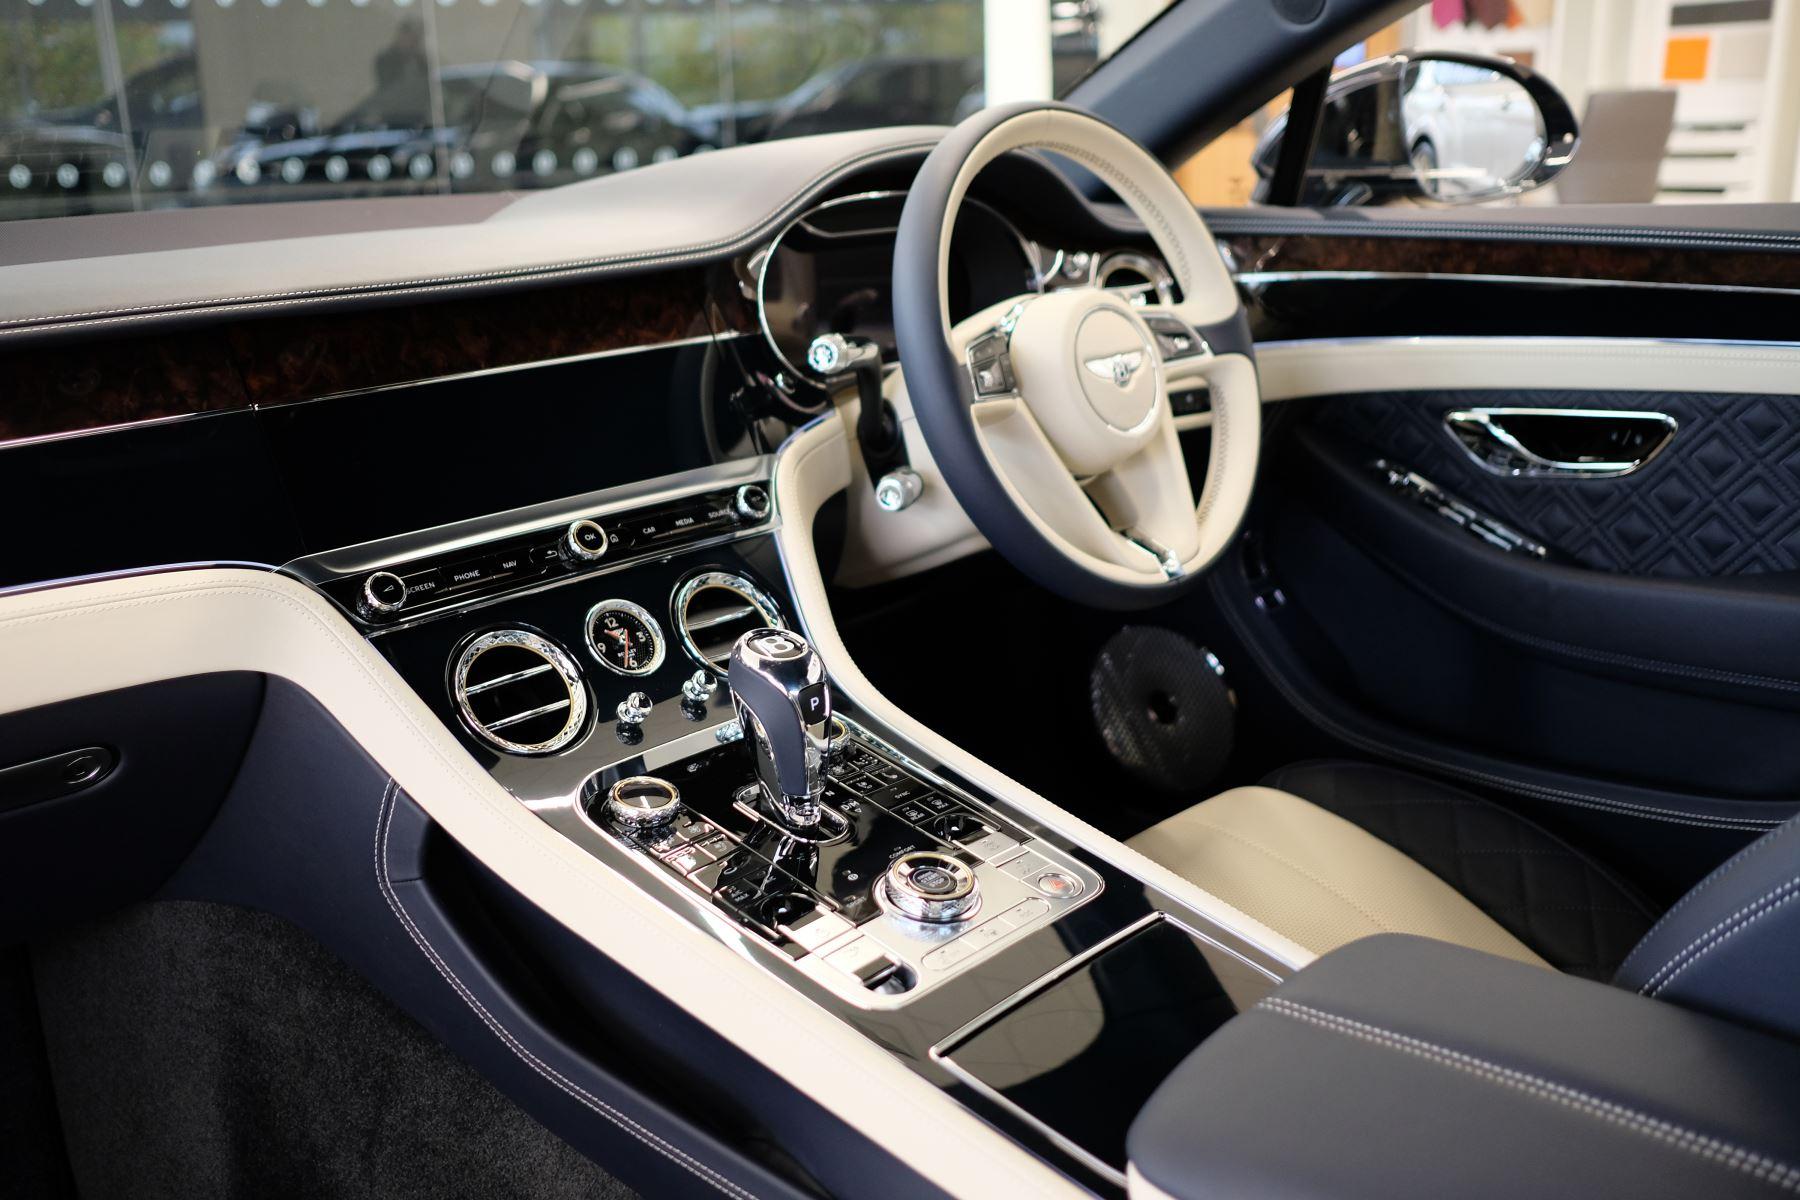 Bentley Continental GT 4.0 V8 Mulliner Edition Auto [Tour Spec] image 11